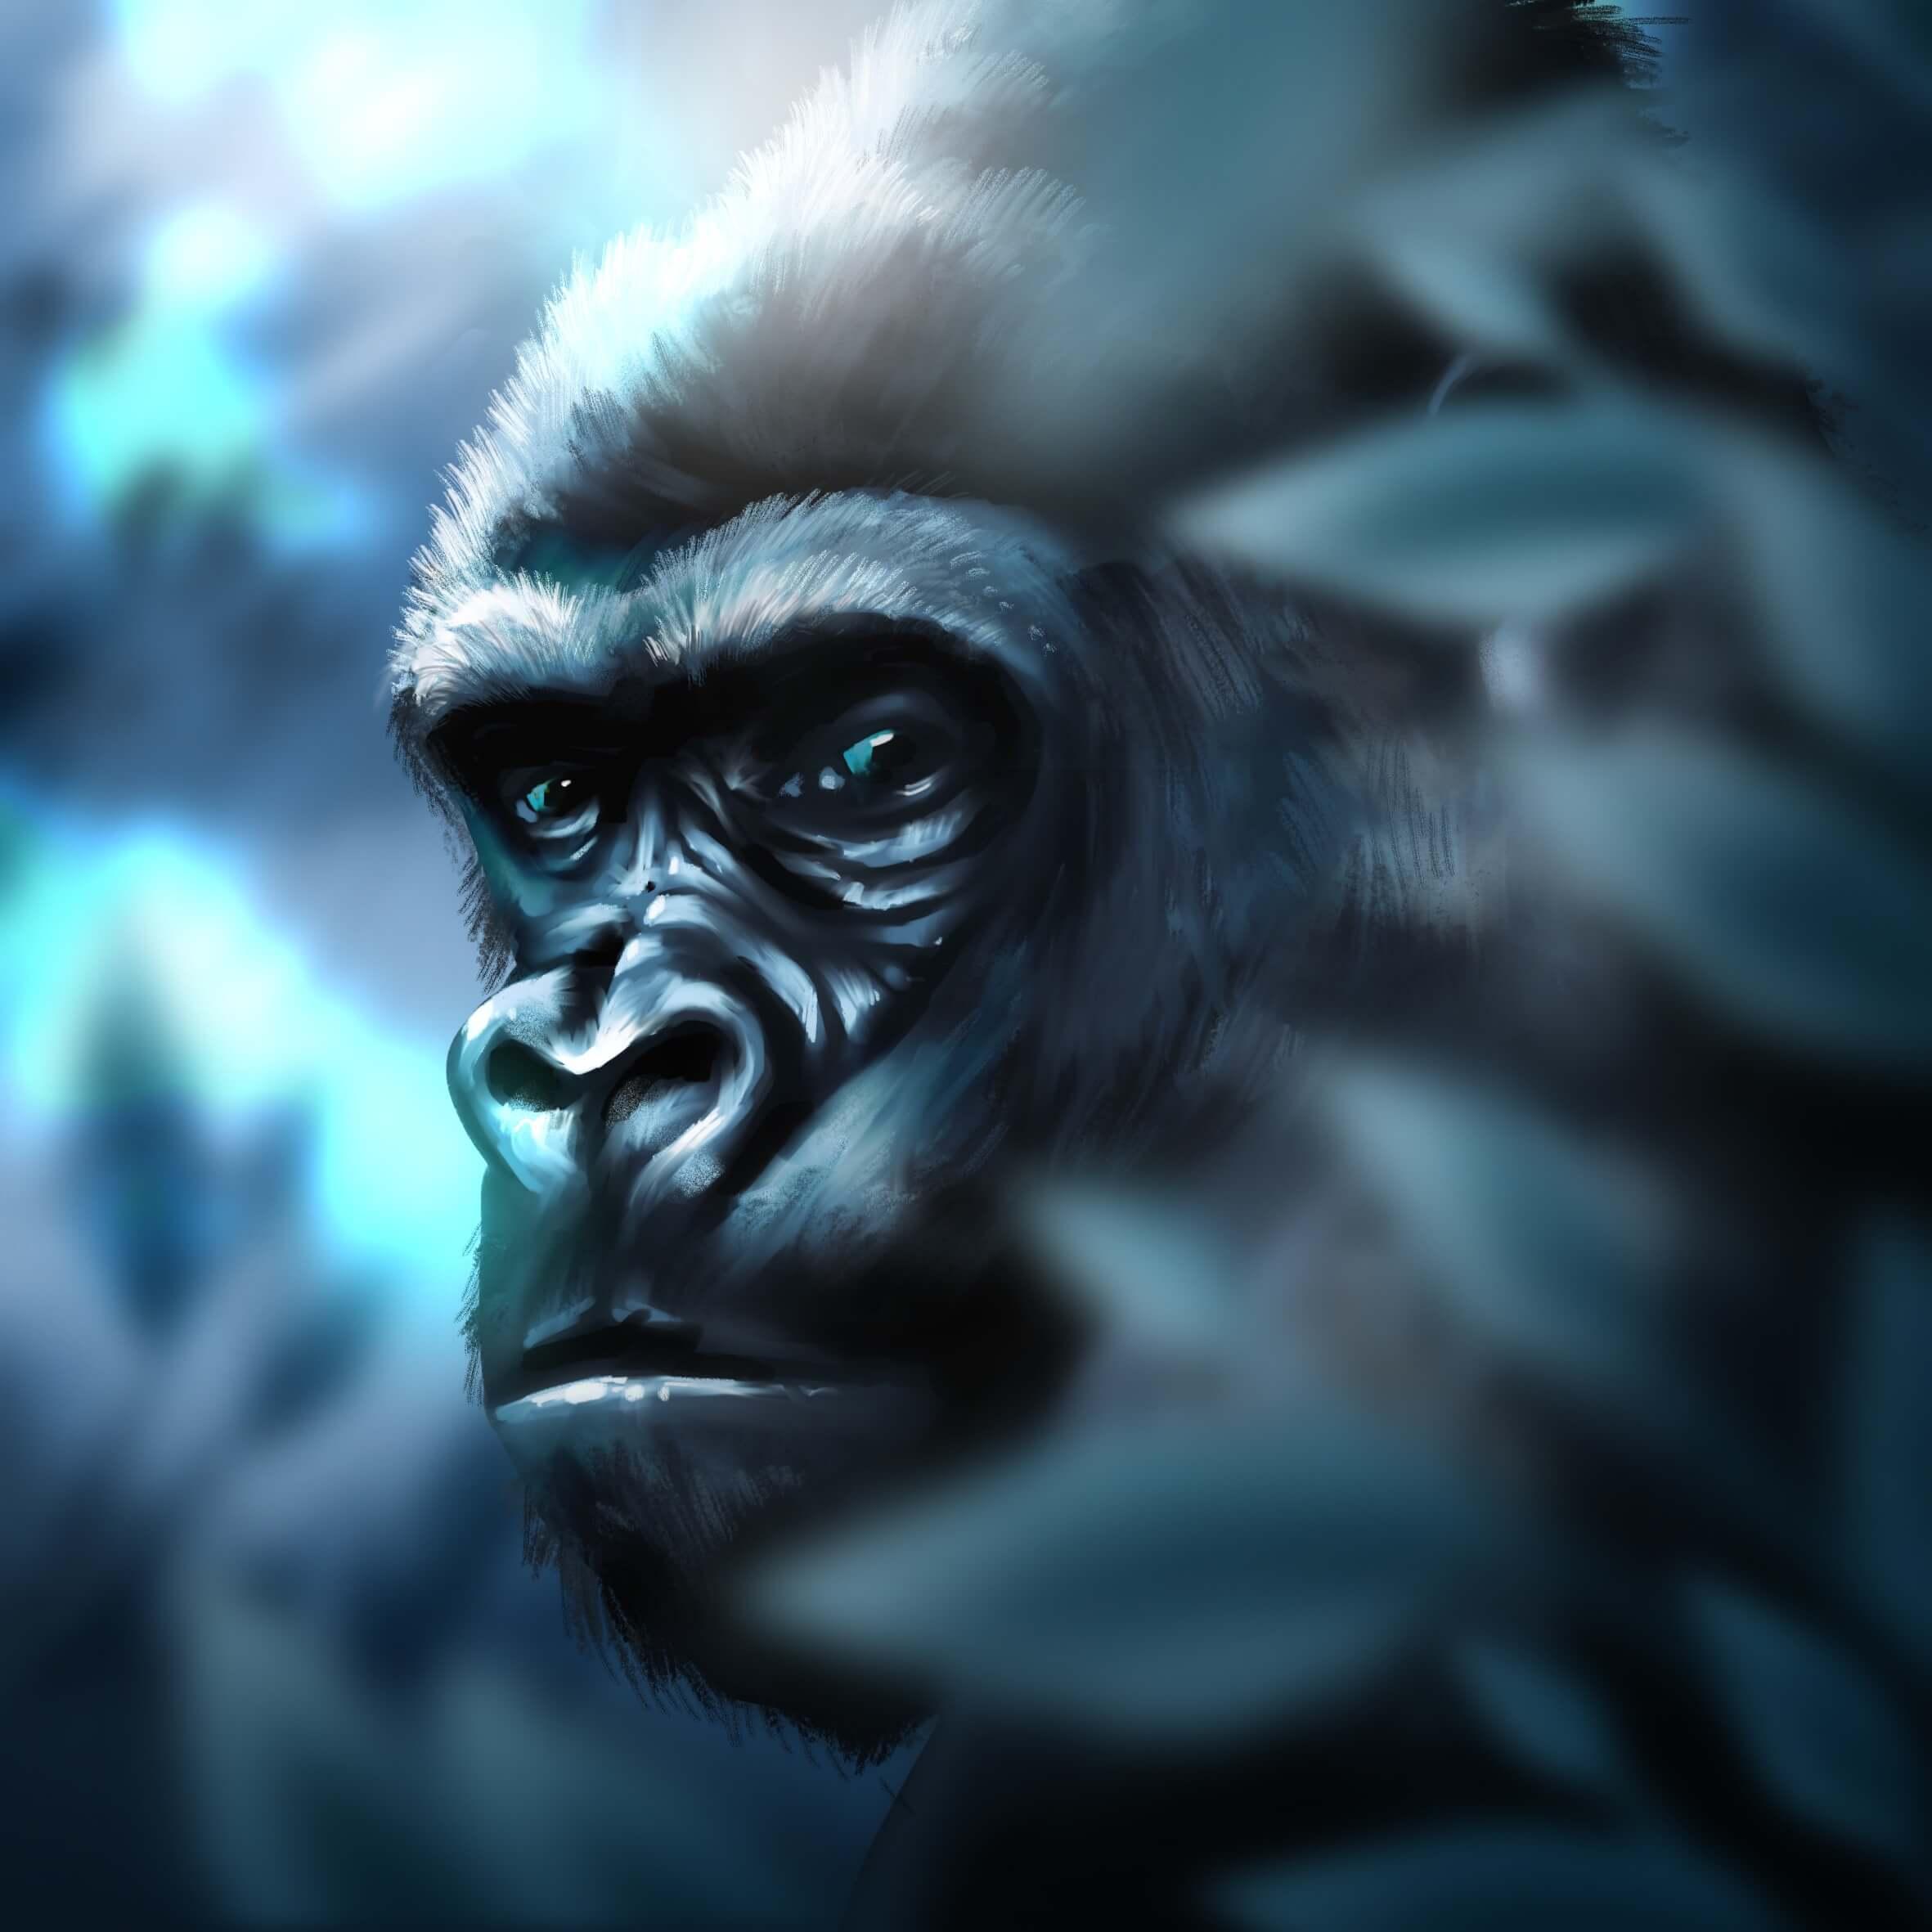 Gorilla_conceptart